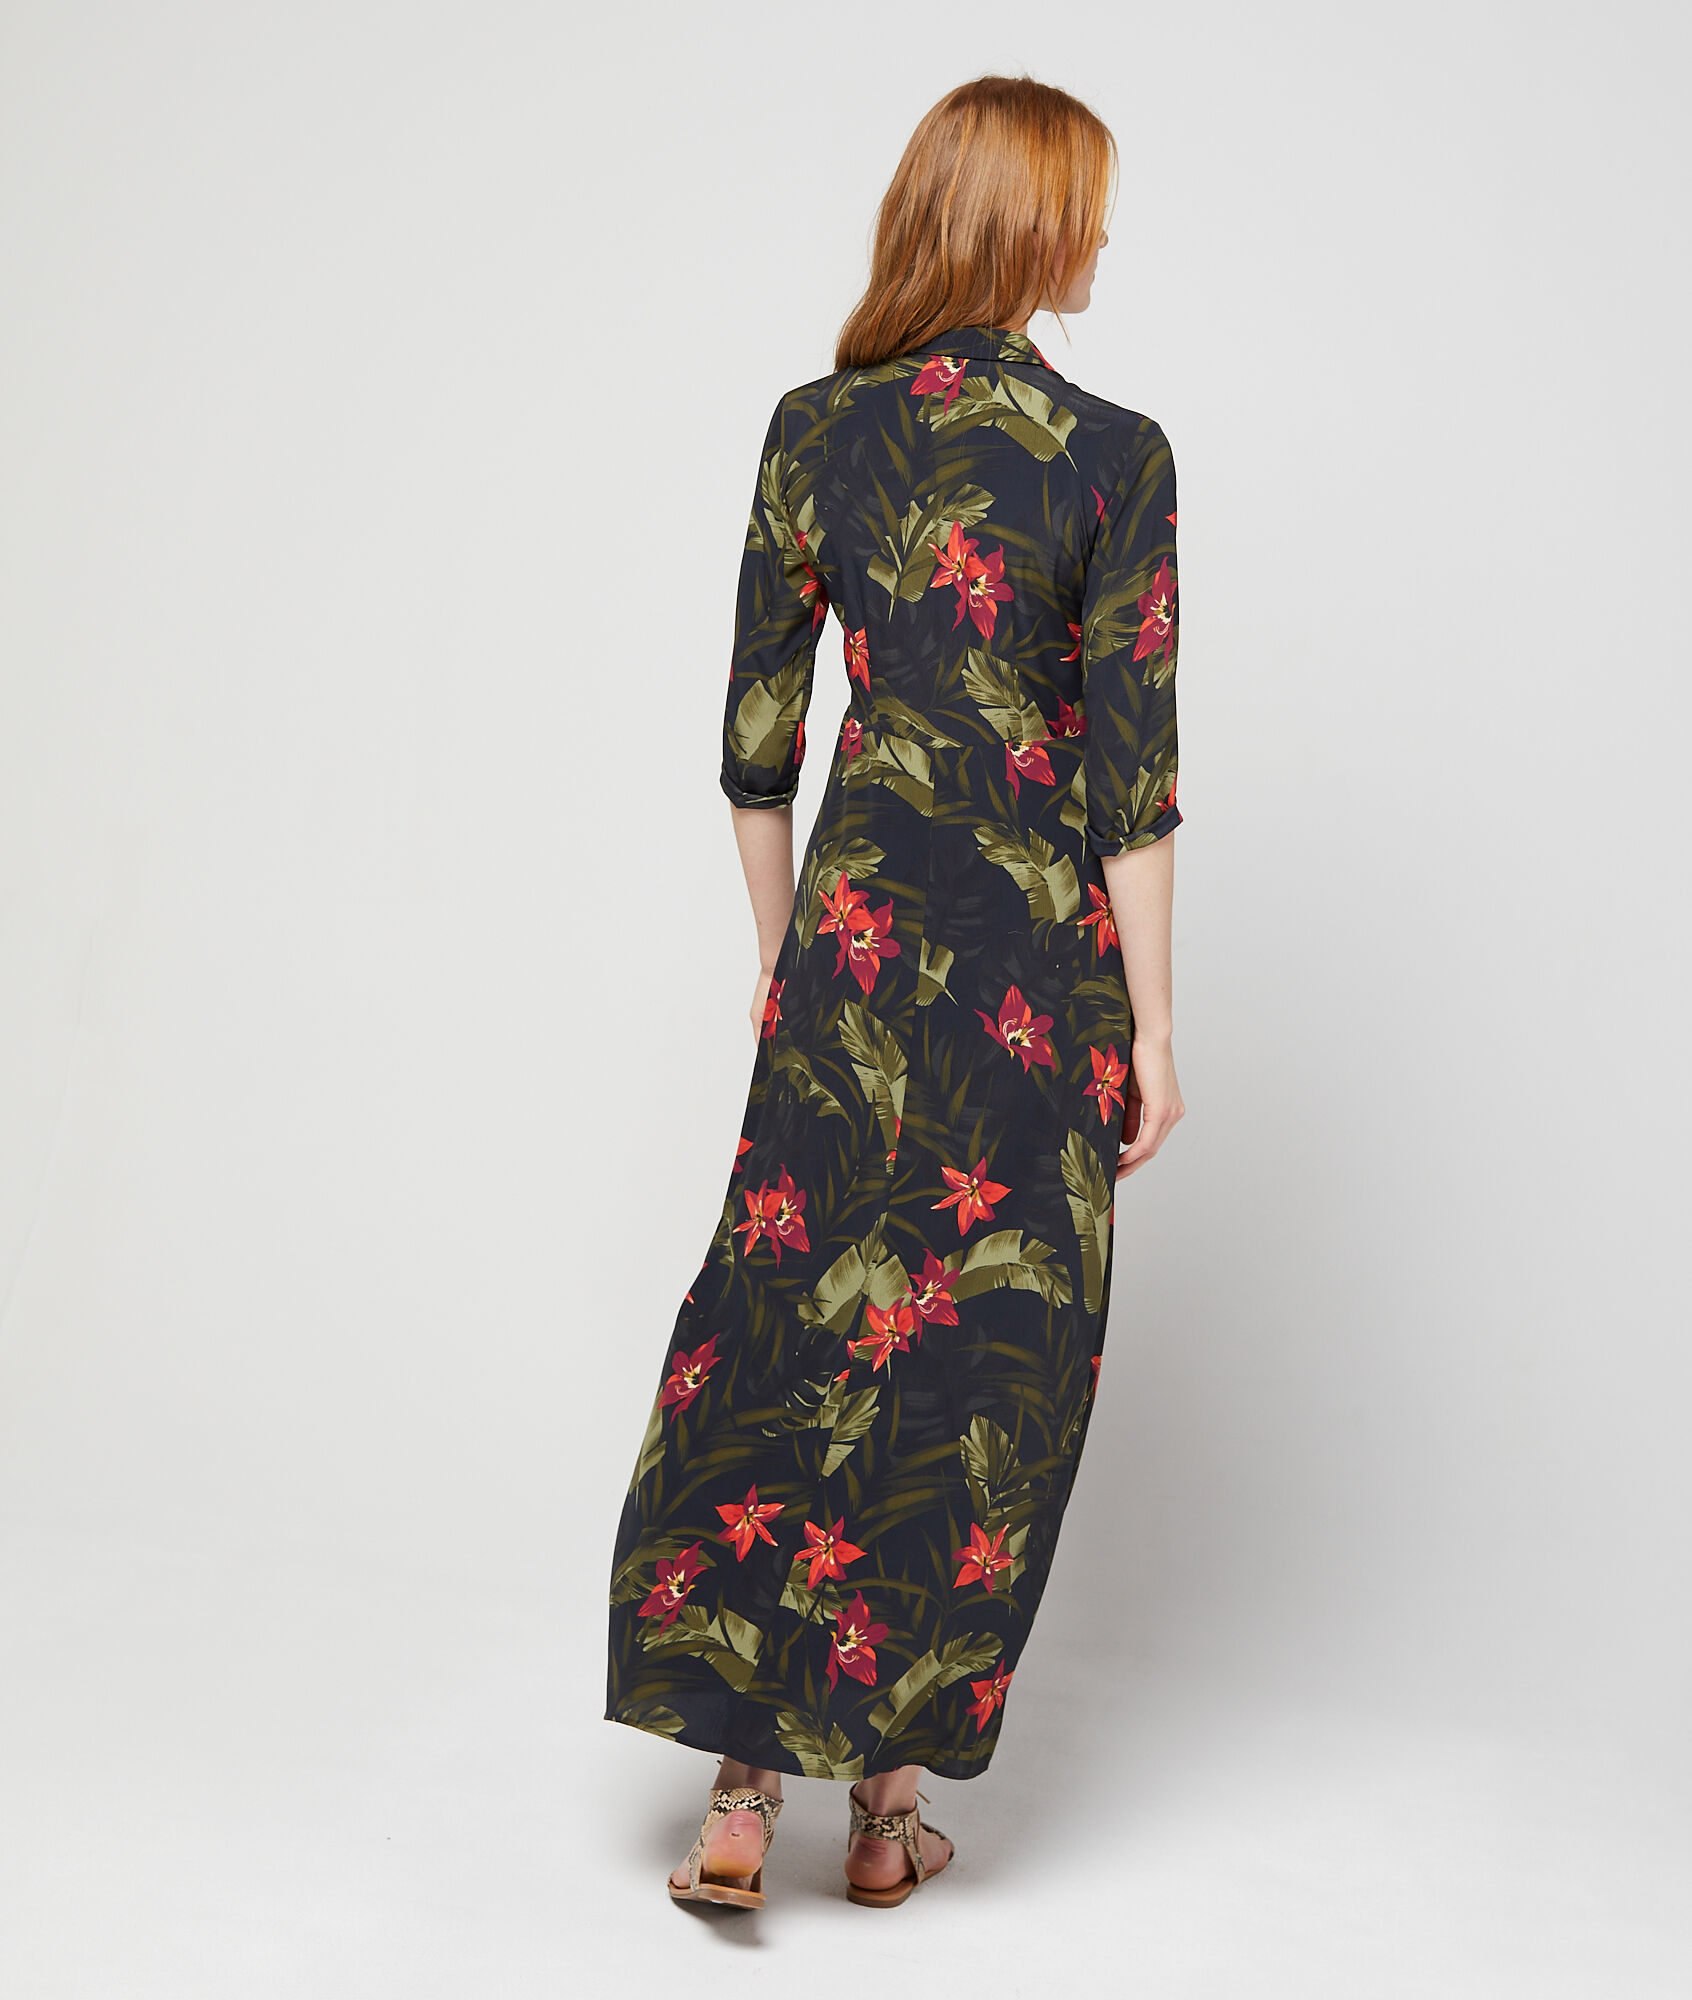 Floral Noir Imprimé Pasada Robe Chemise À Etam tshrdQC